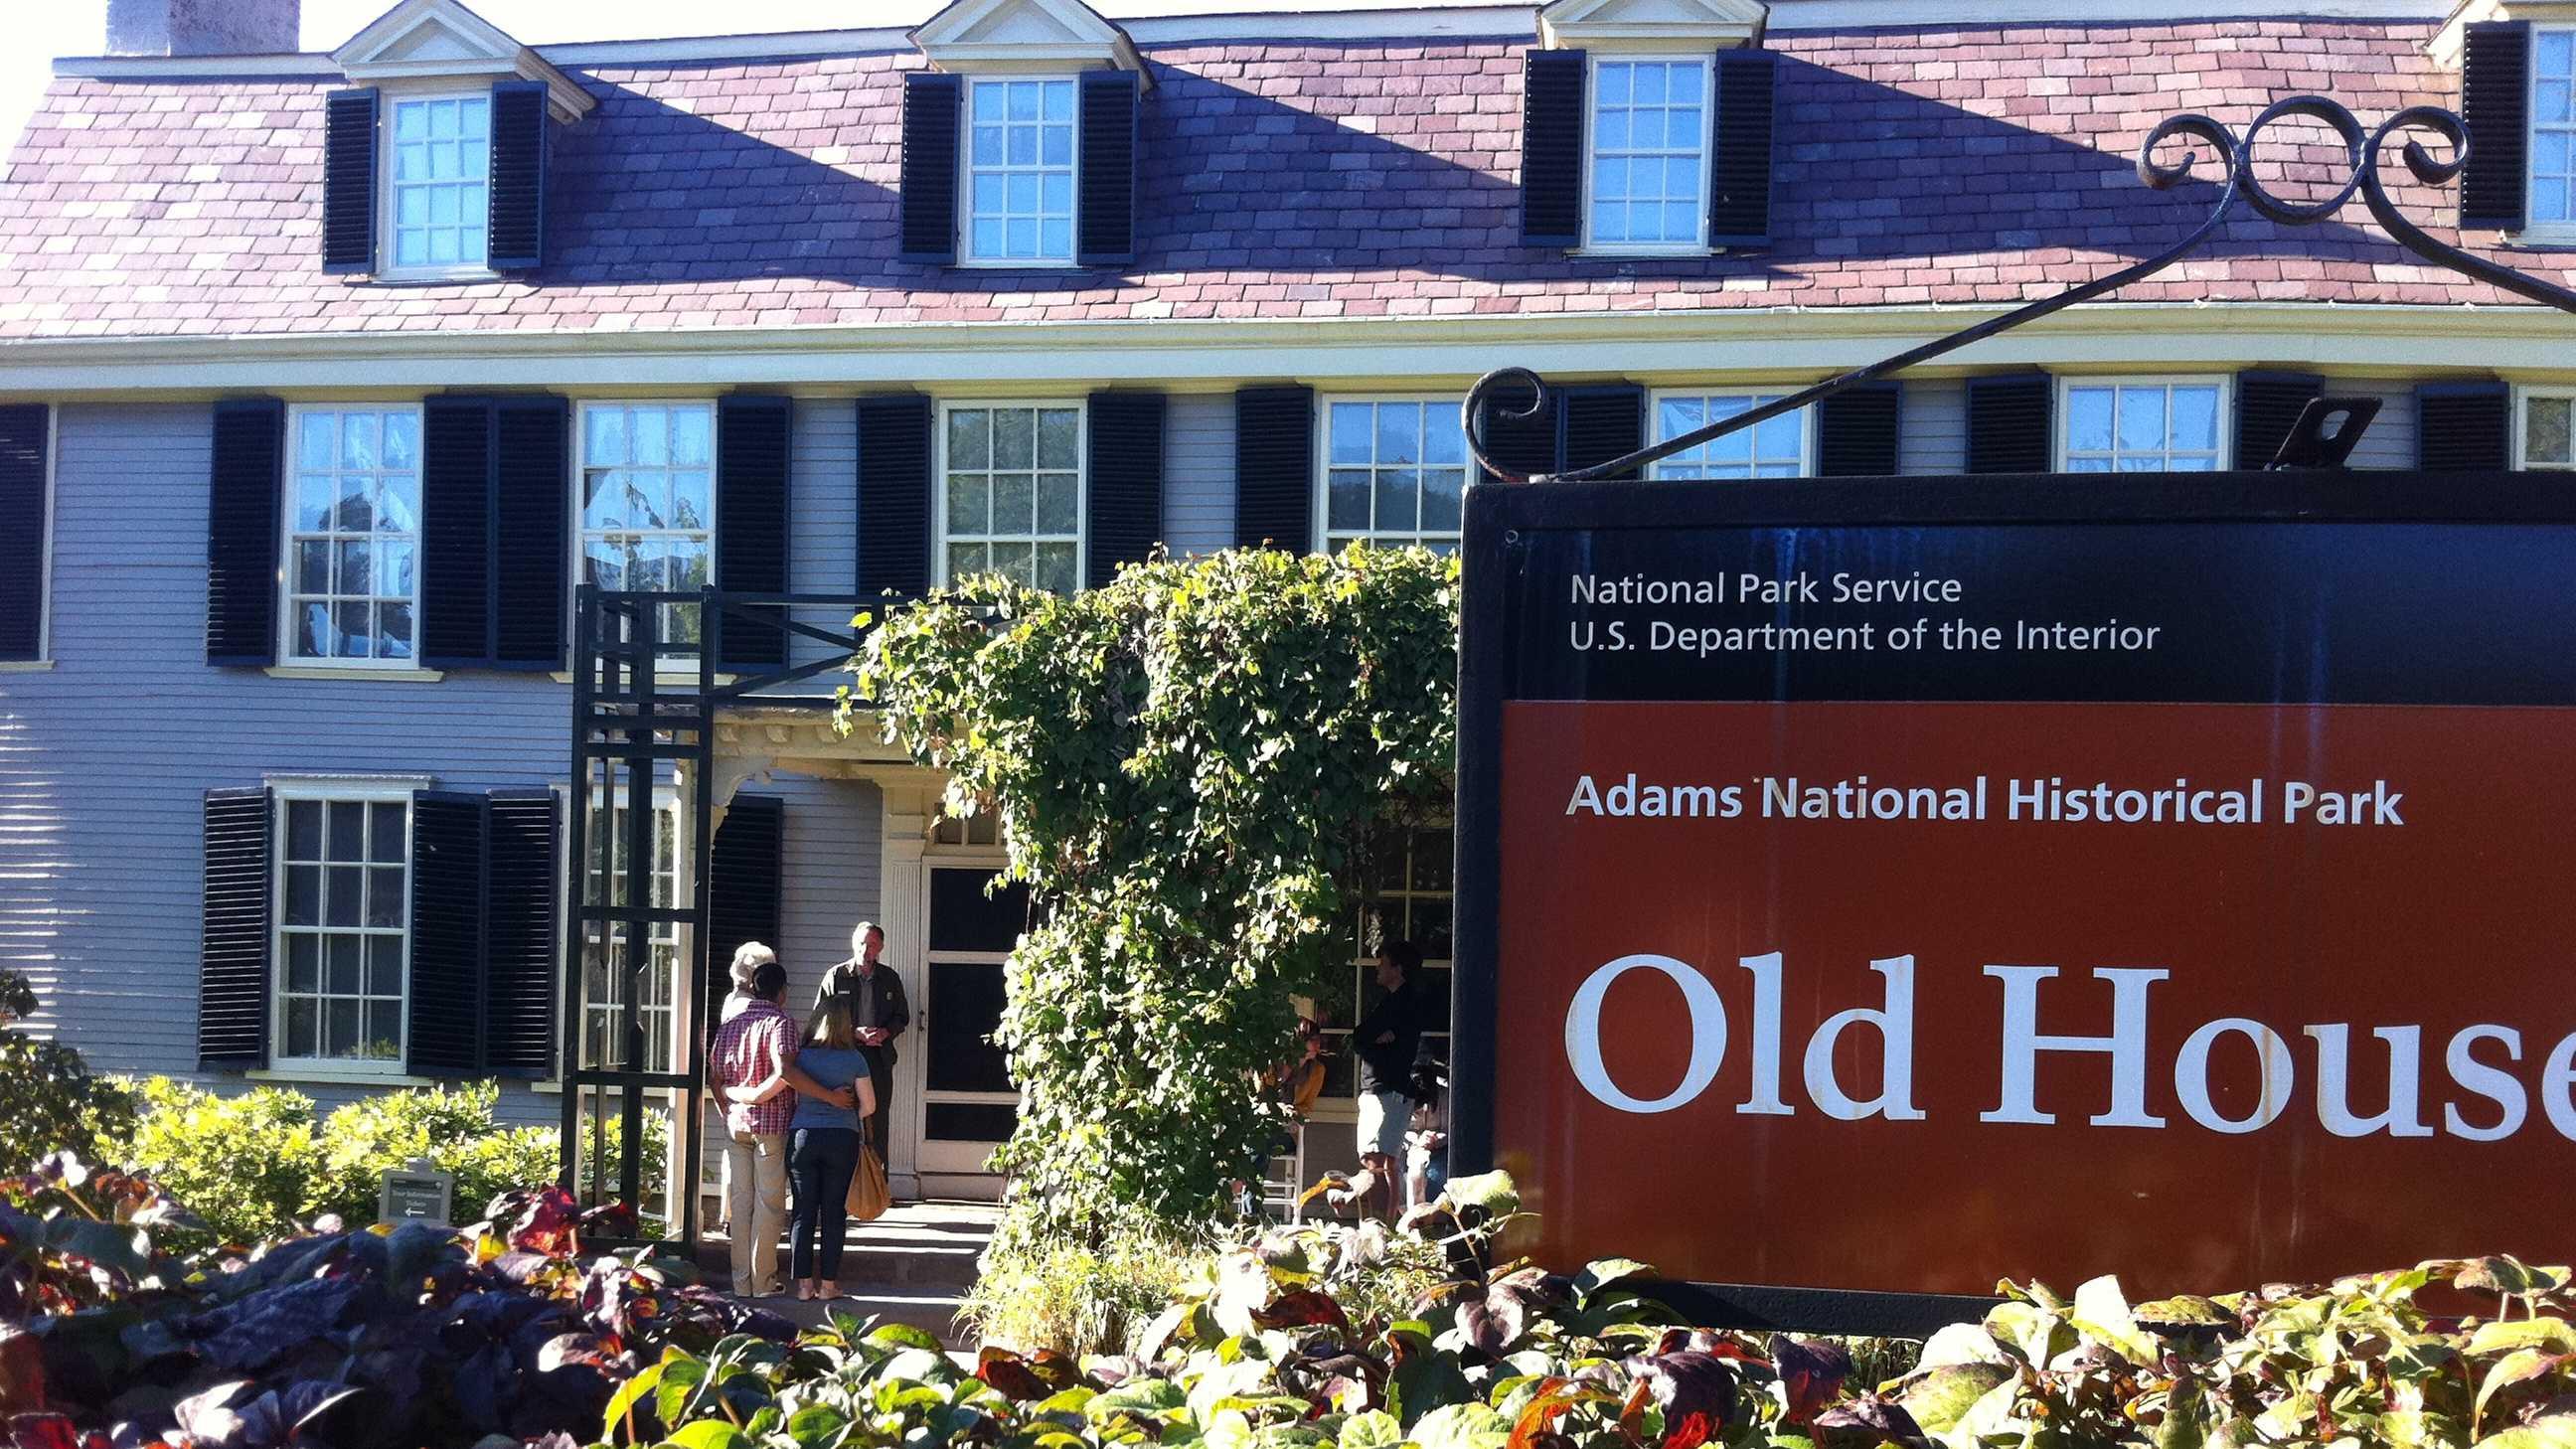 Adams National Historic Park